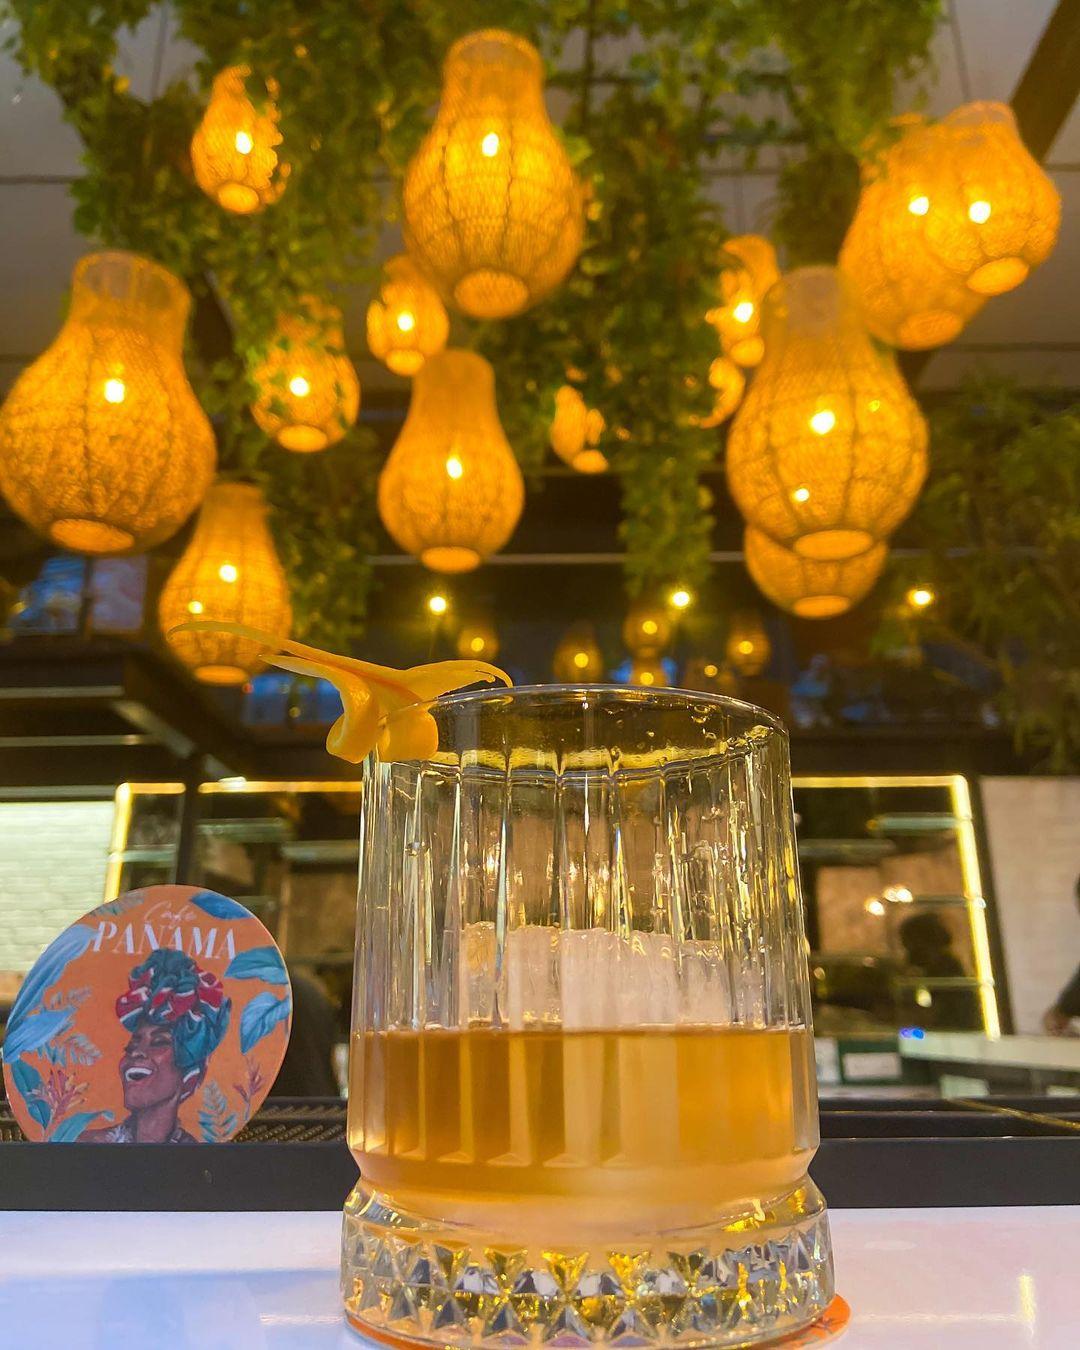 Panama (tequila infused with rosemary, thyme and orange zest). Photo courtesy: Instagram/Café Panama